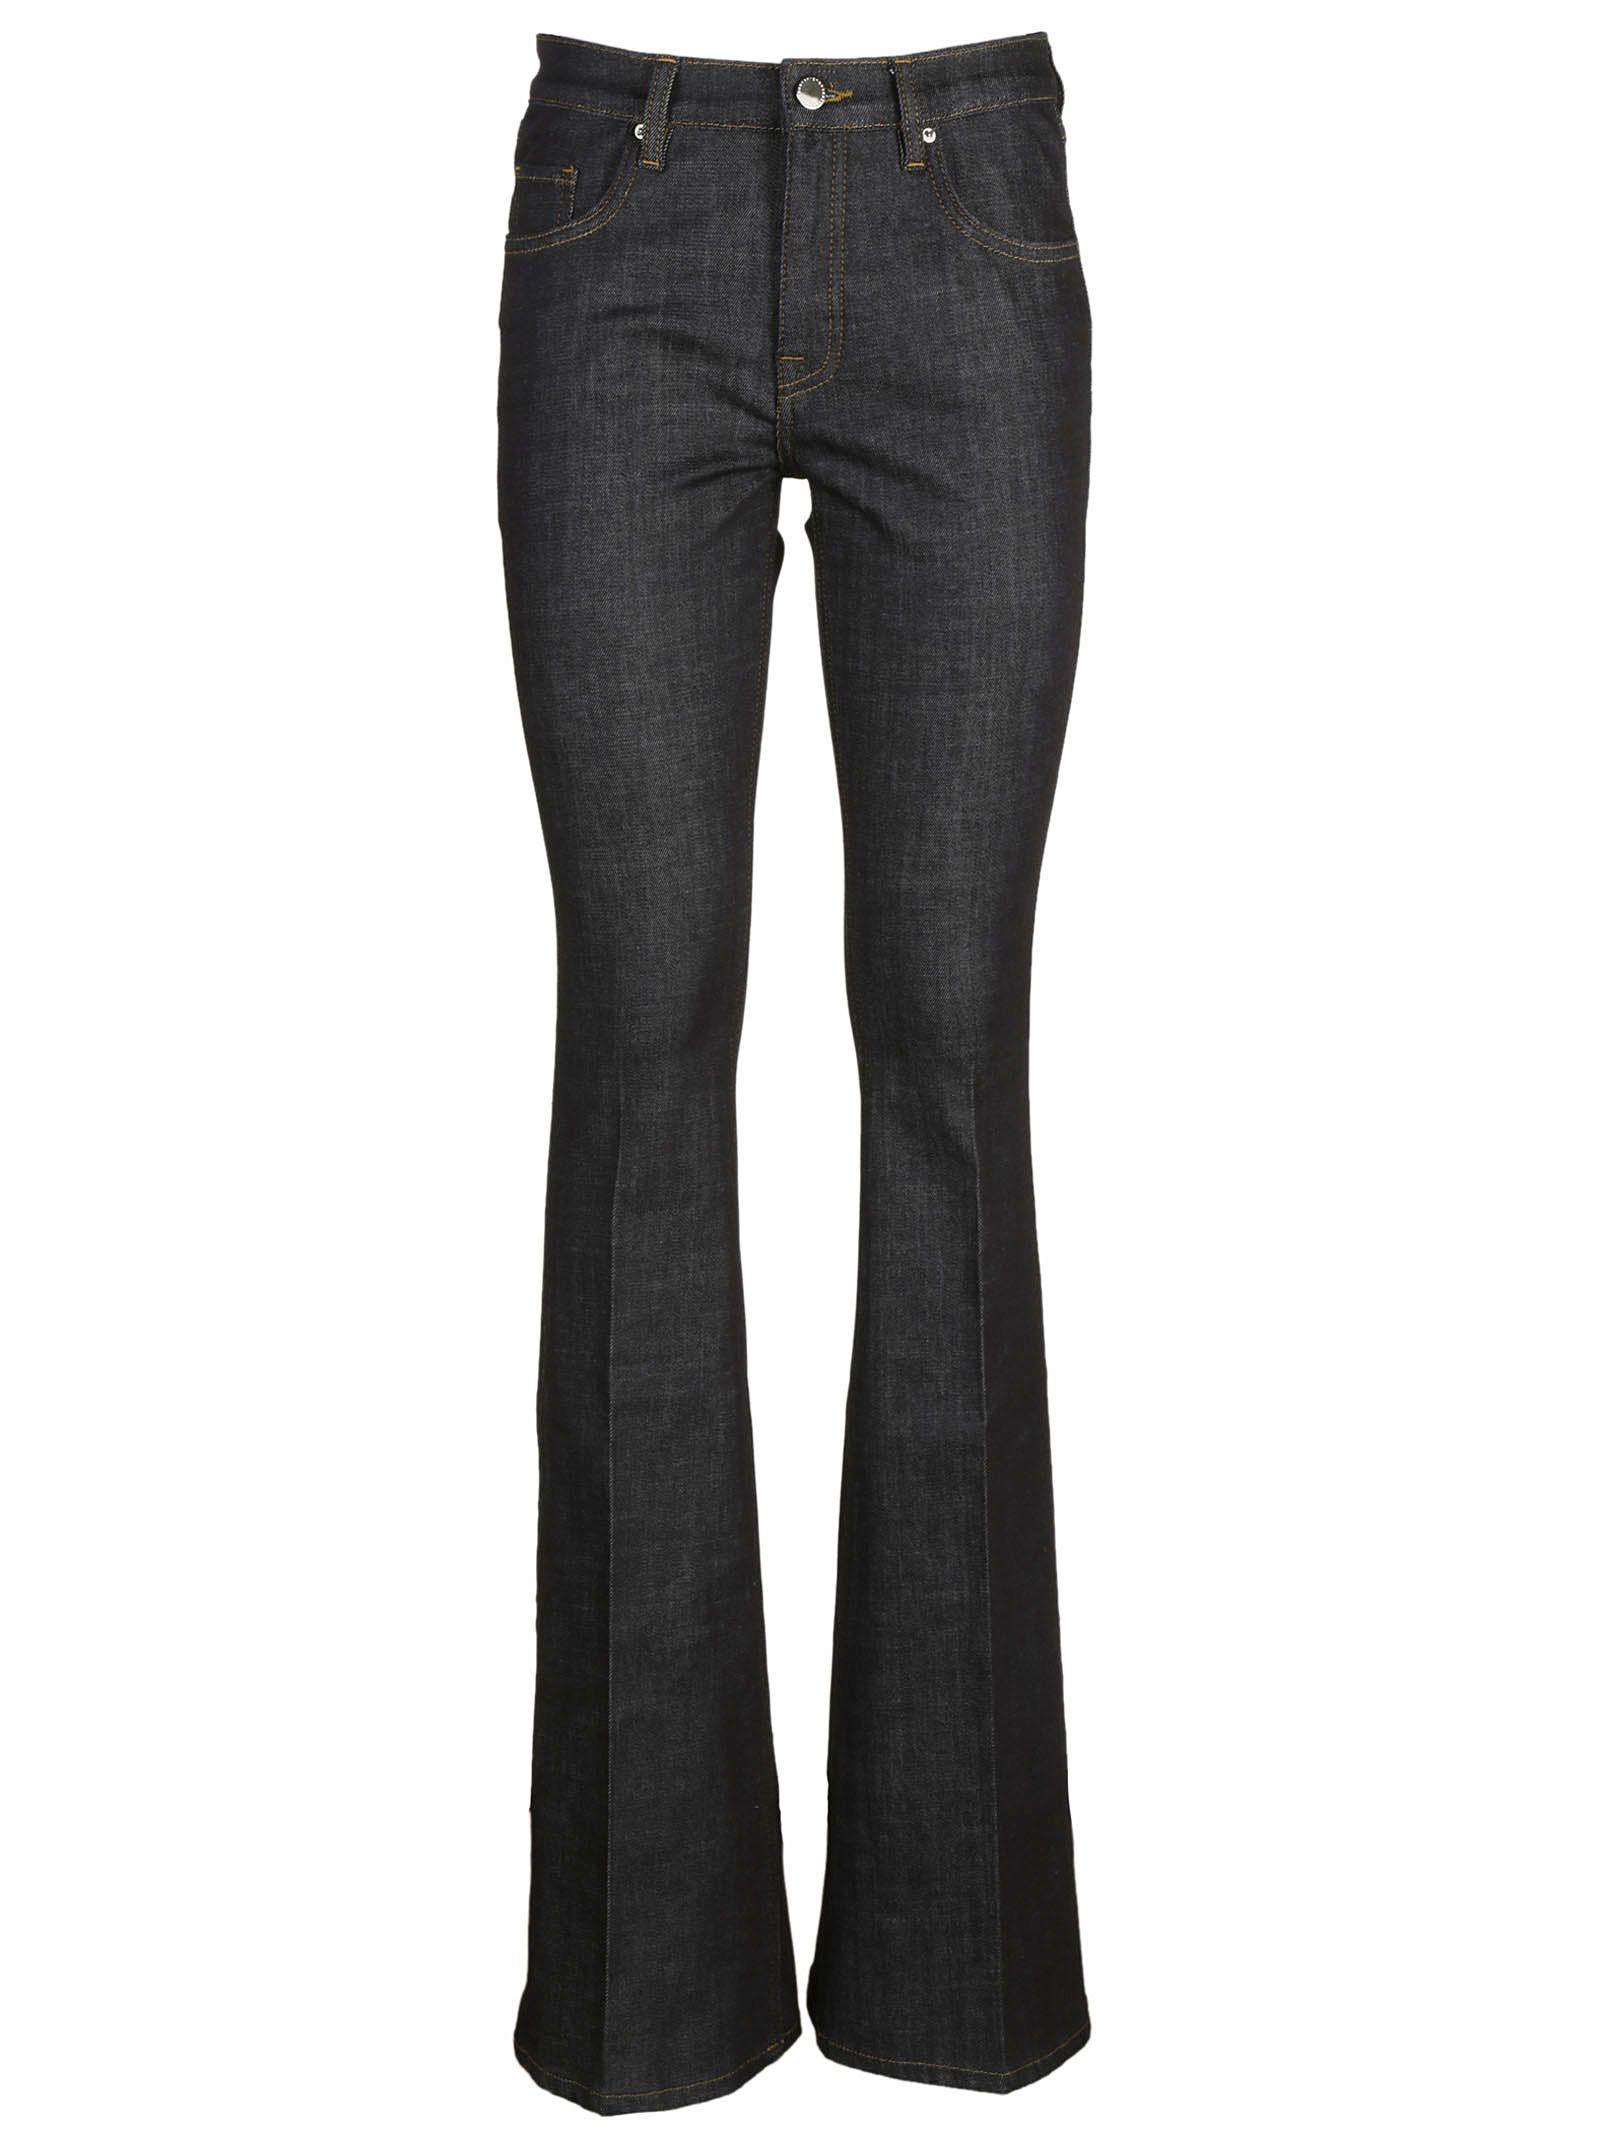 victoria beckham victoria beckham flared jeans blue women 39 s jeans italist. Black Bedroom Furniture Sets. Home Design Ideas